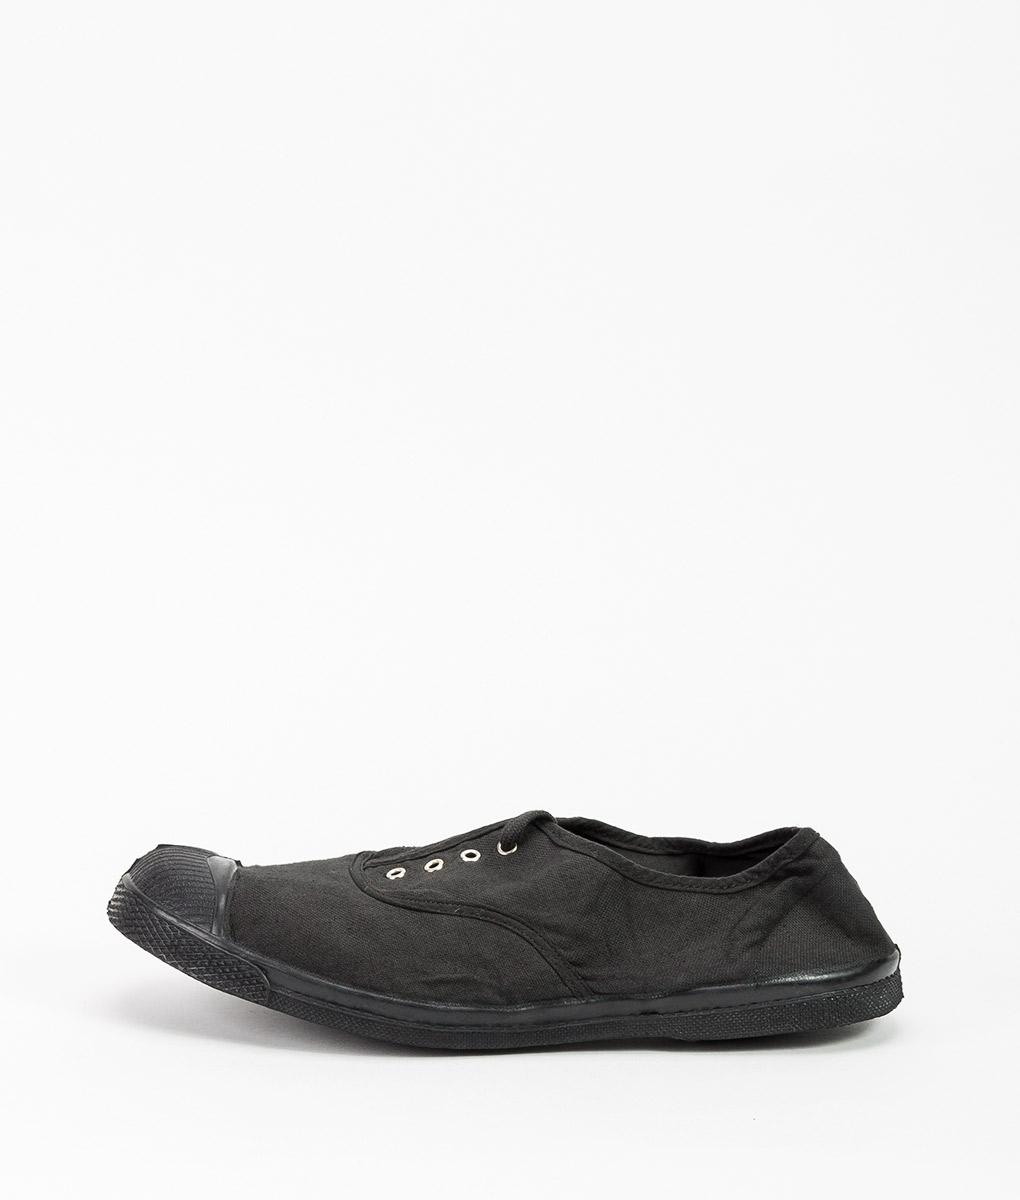 BENSIMON Men Sneakers 0835 COLORSOLE Carbone 44.99 1